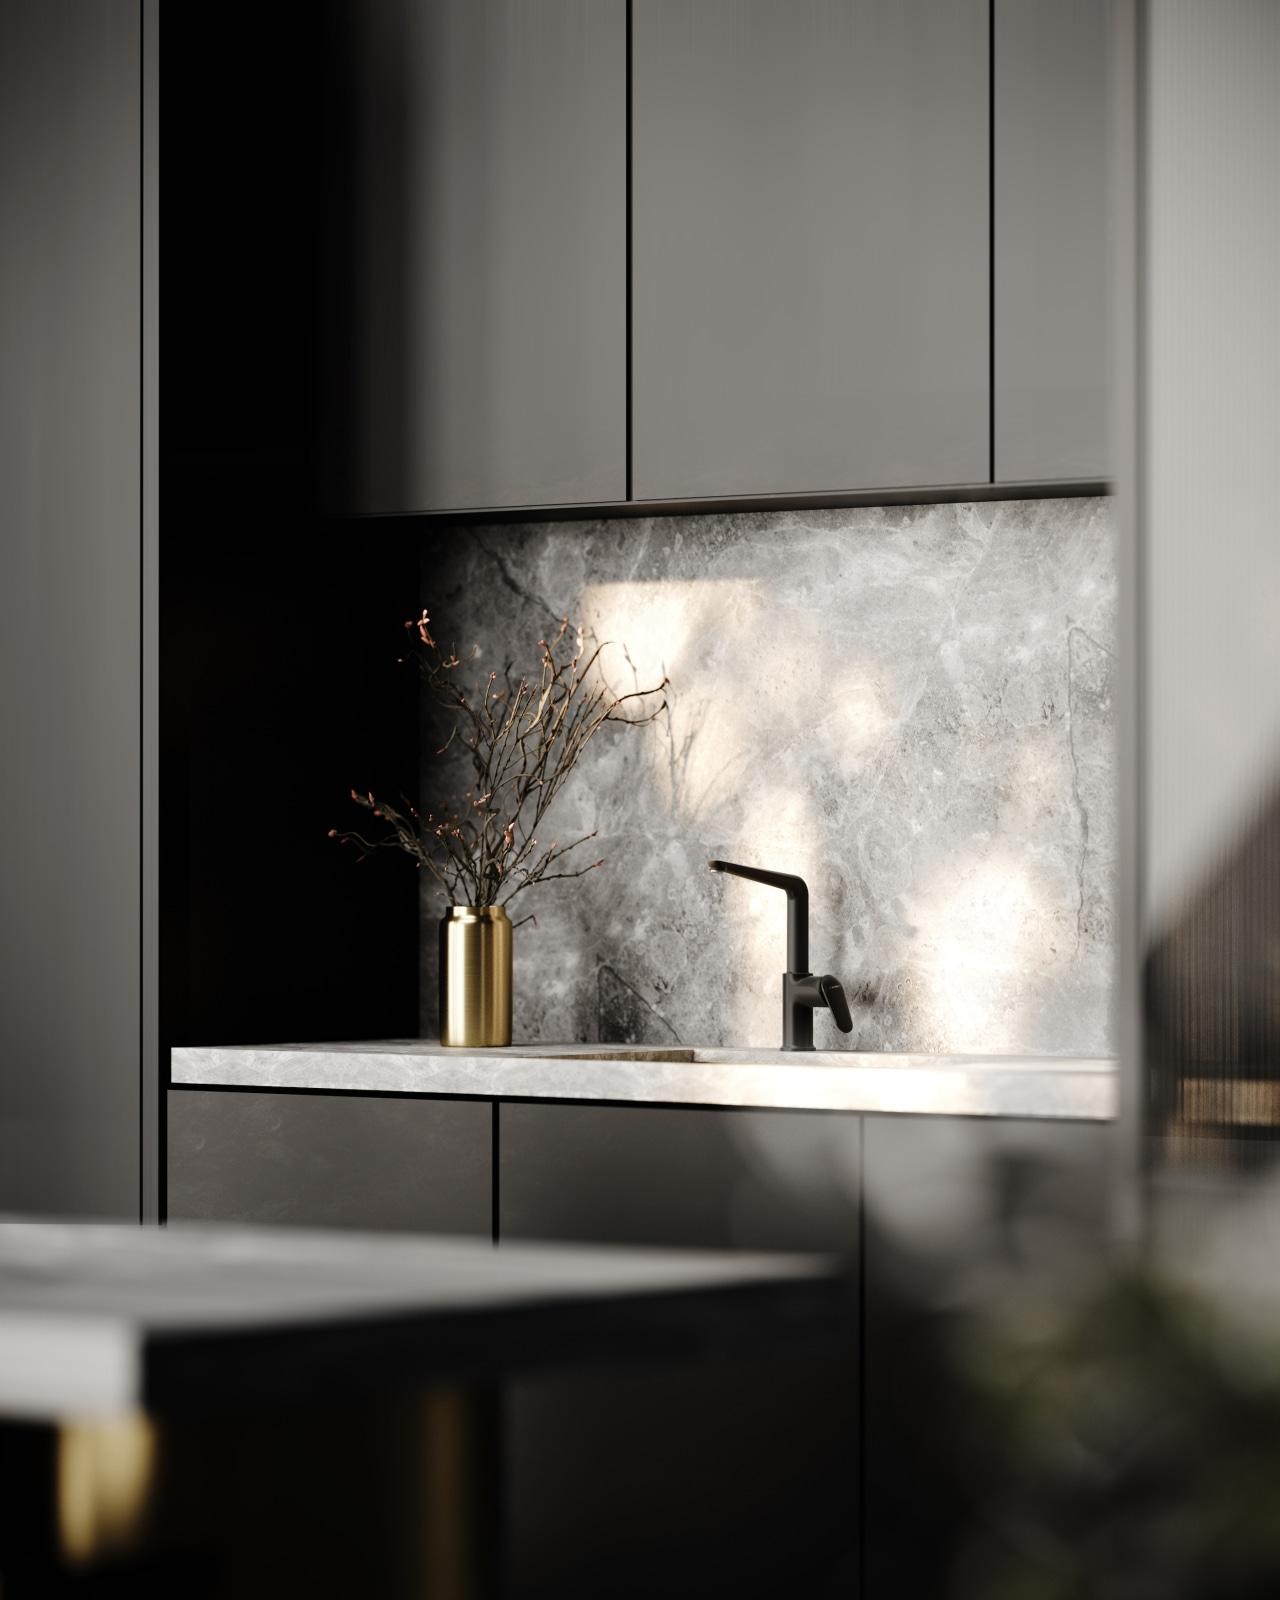 The Aio Kitchen Mixer. - Great design on